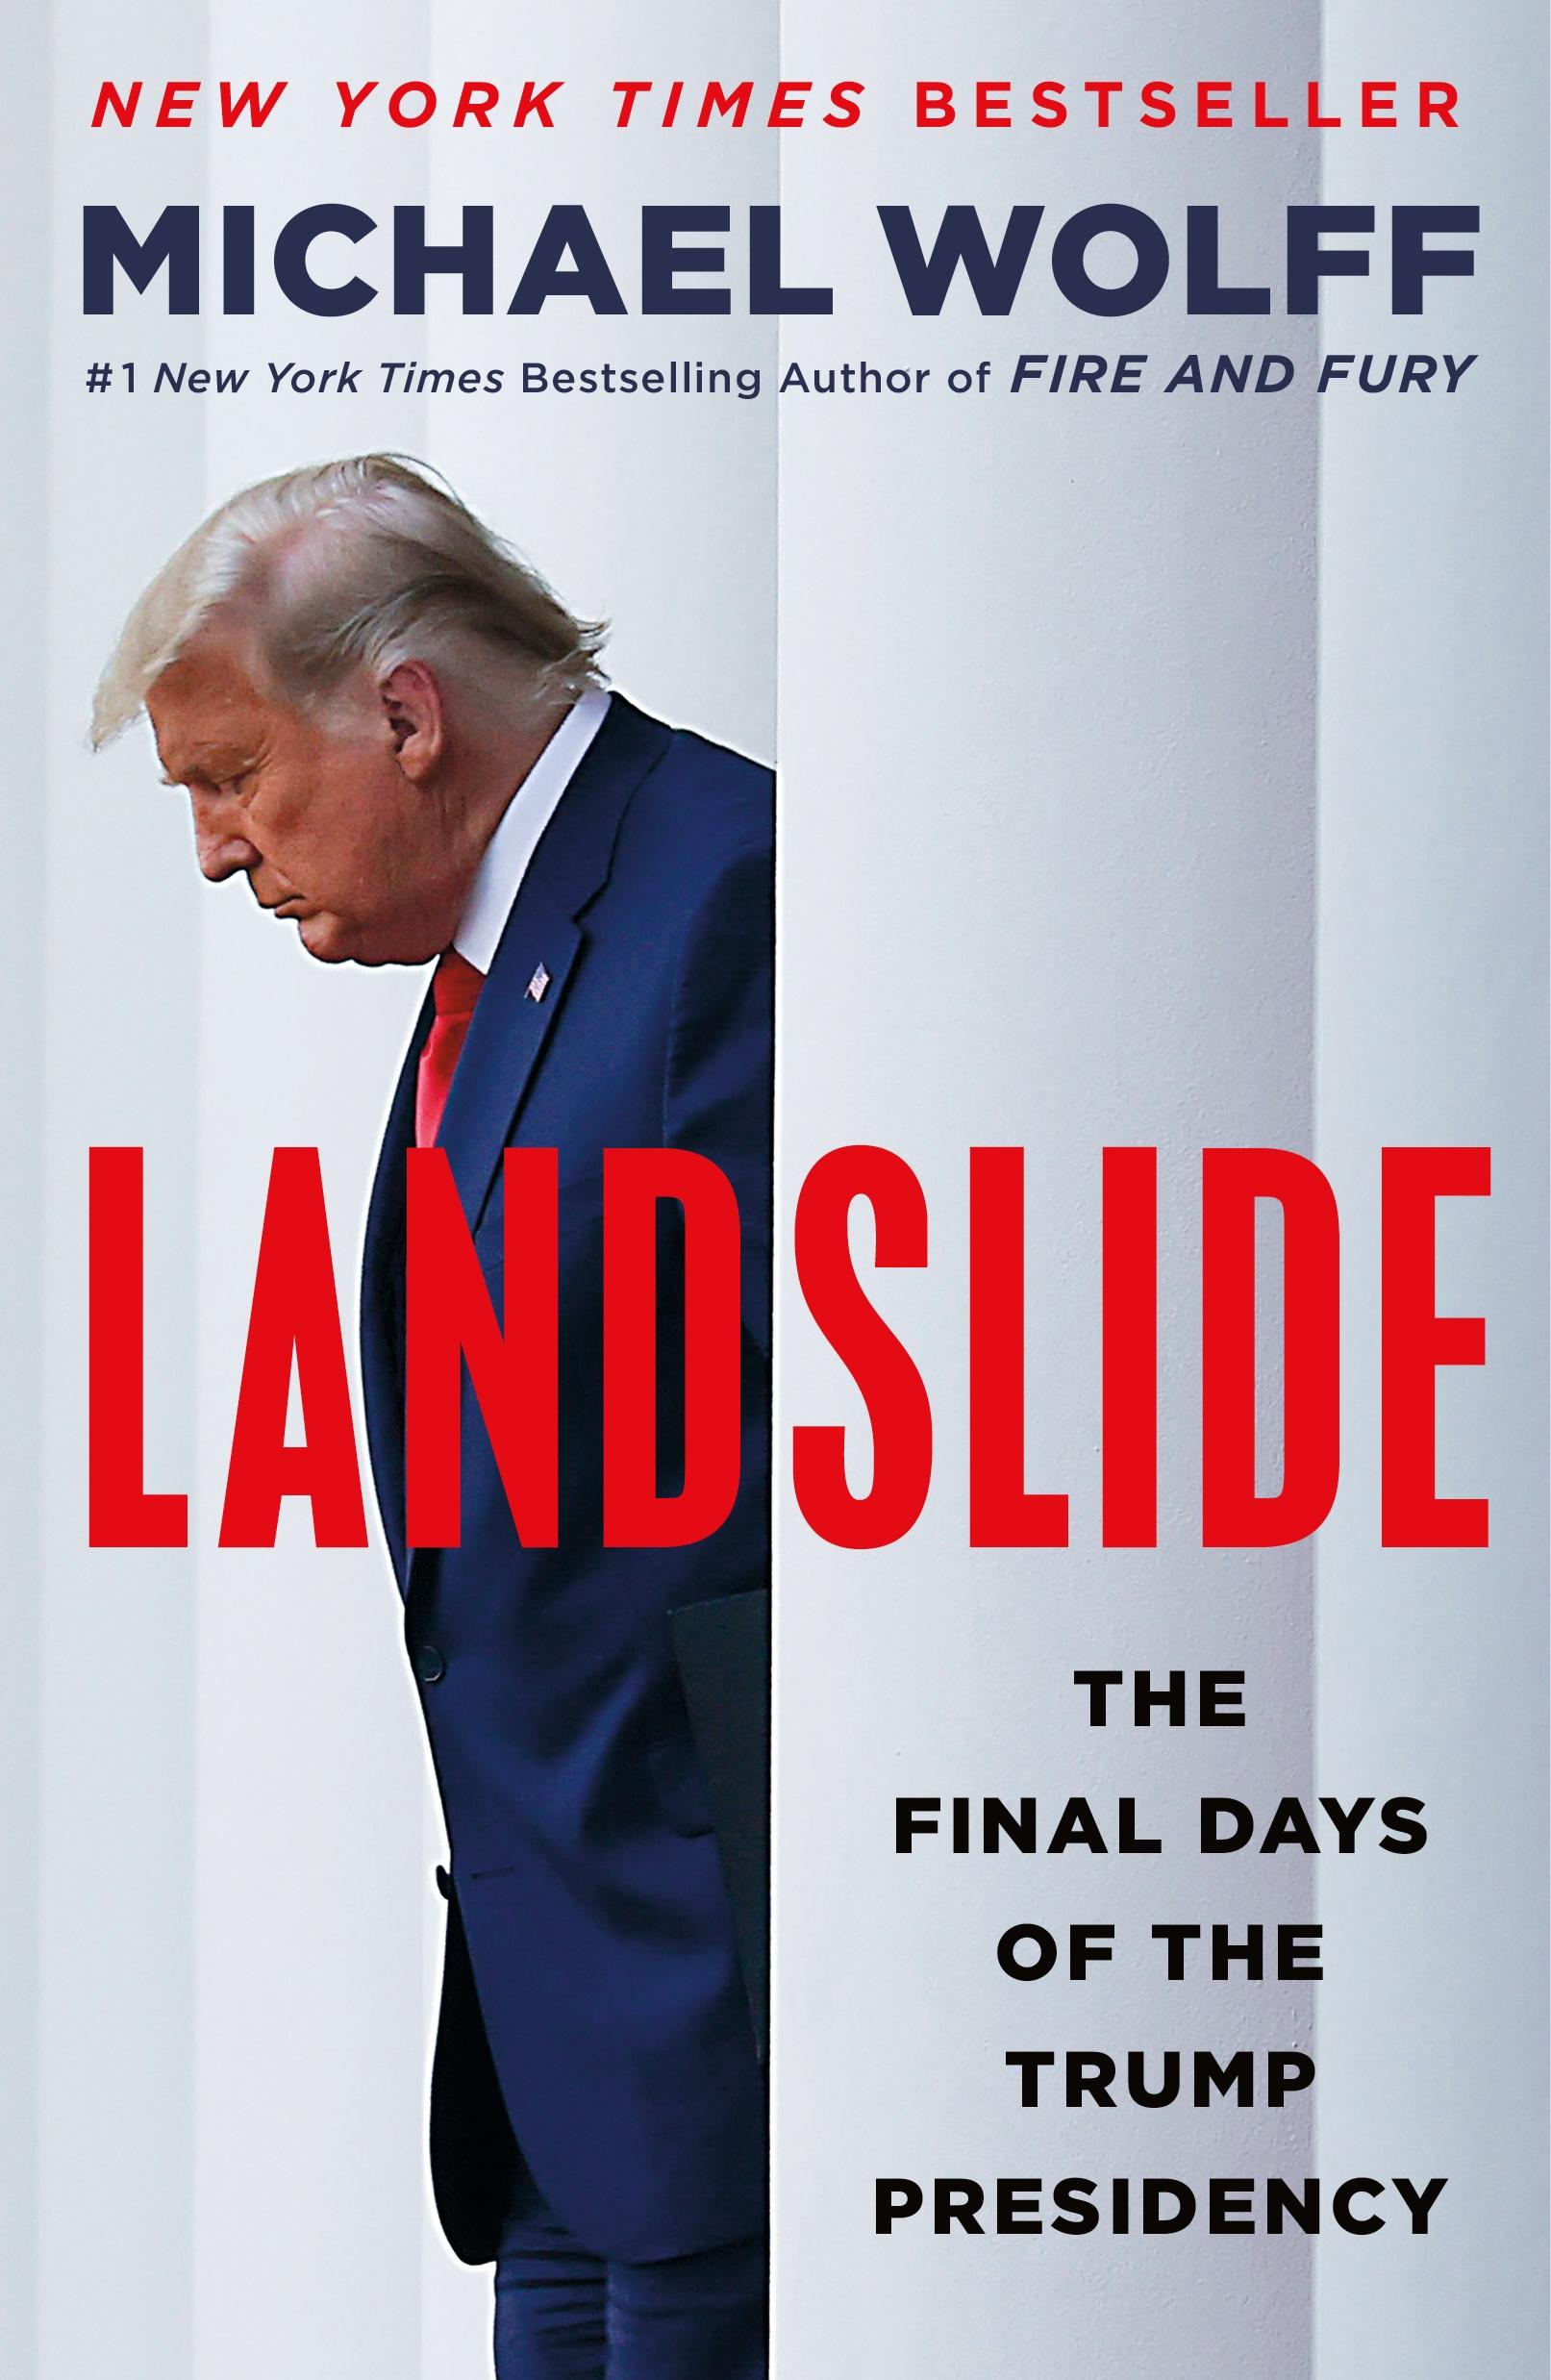 Landslide The Final Days of the Trump Presidency